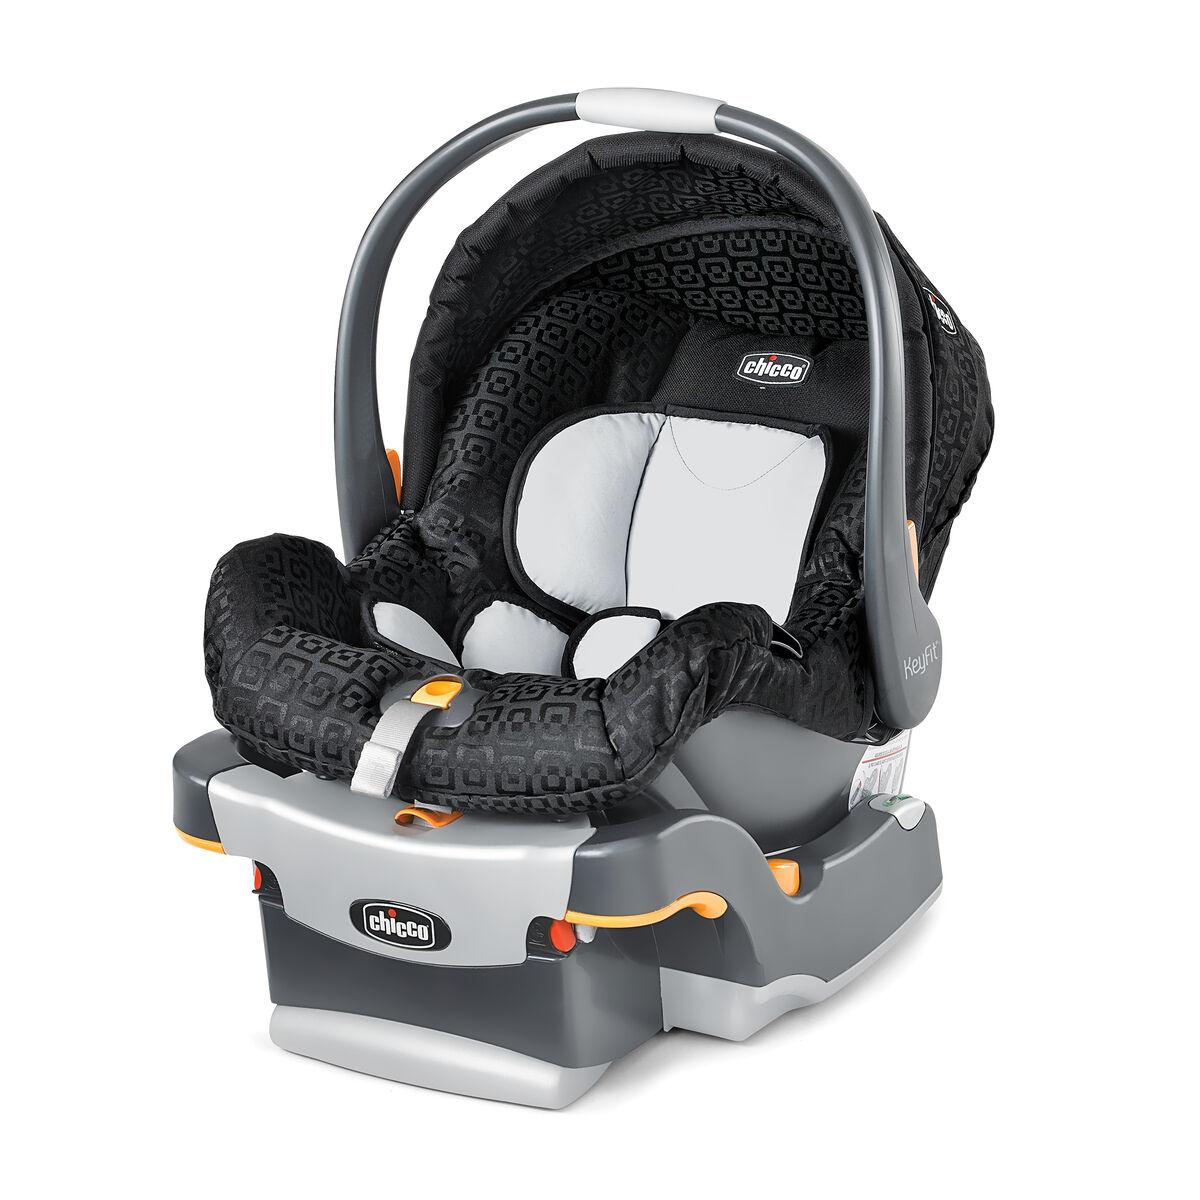 Keyfit infant car seat base ombrakeyfit infant car seat and base ombra